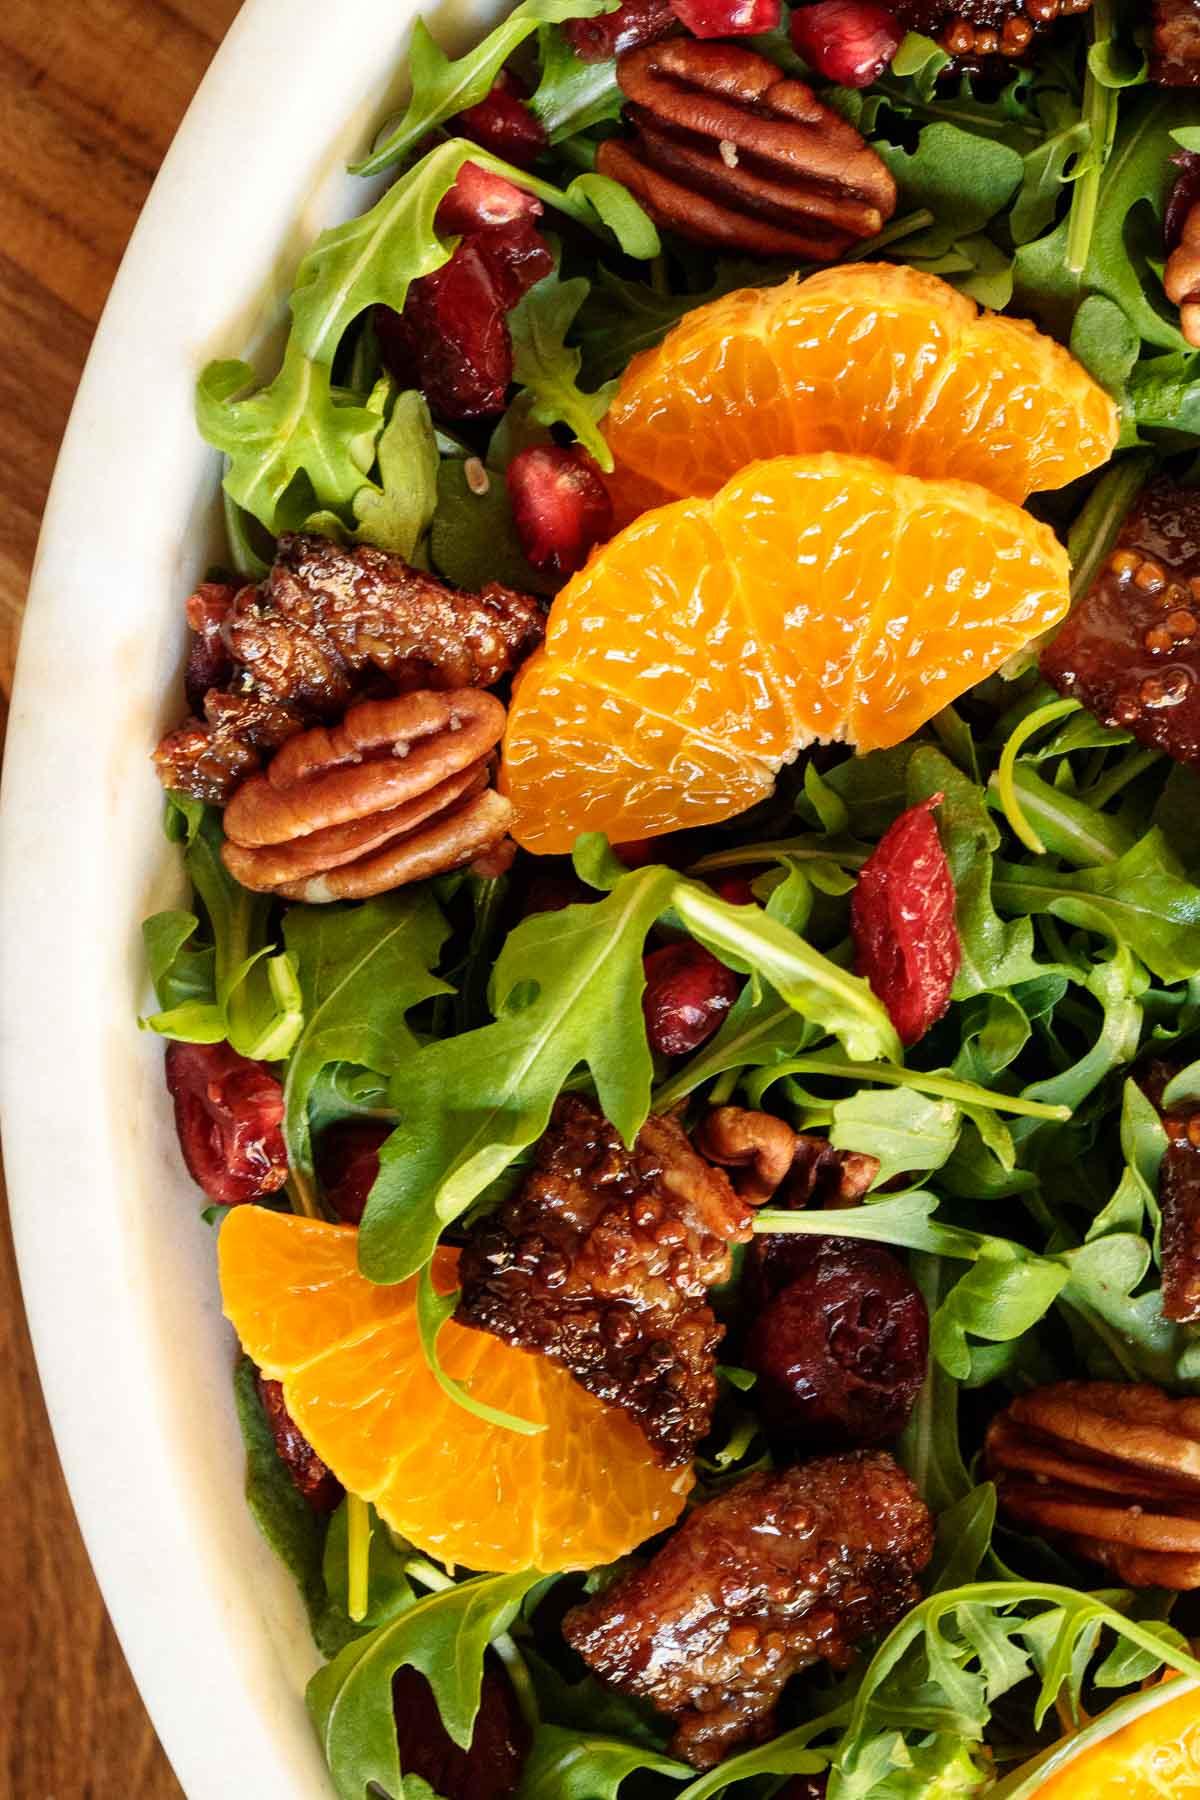 Extreme closeup photo of a bowl of Cranberry Clementine Arugula Salad.